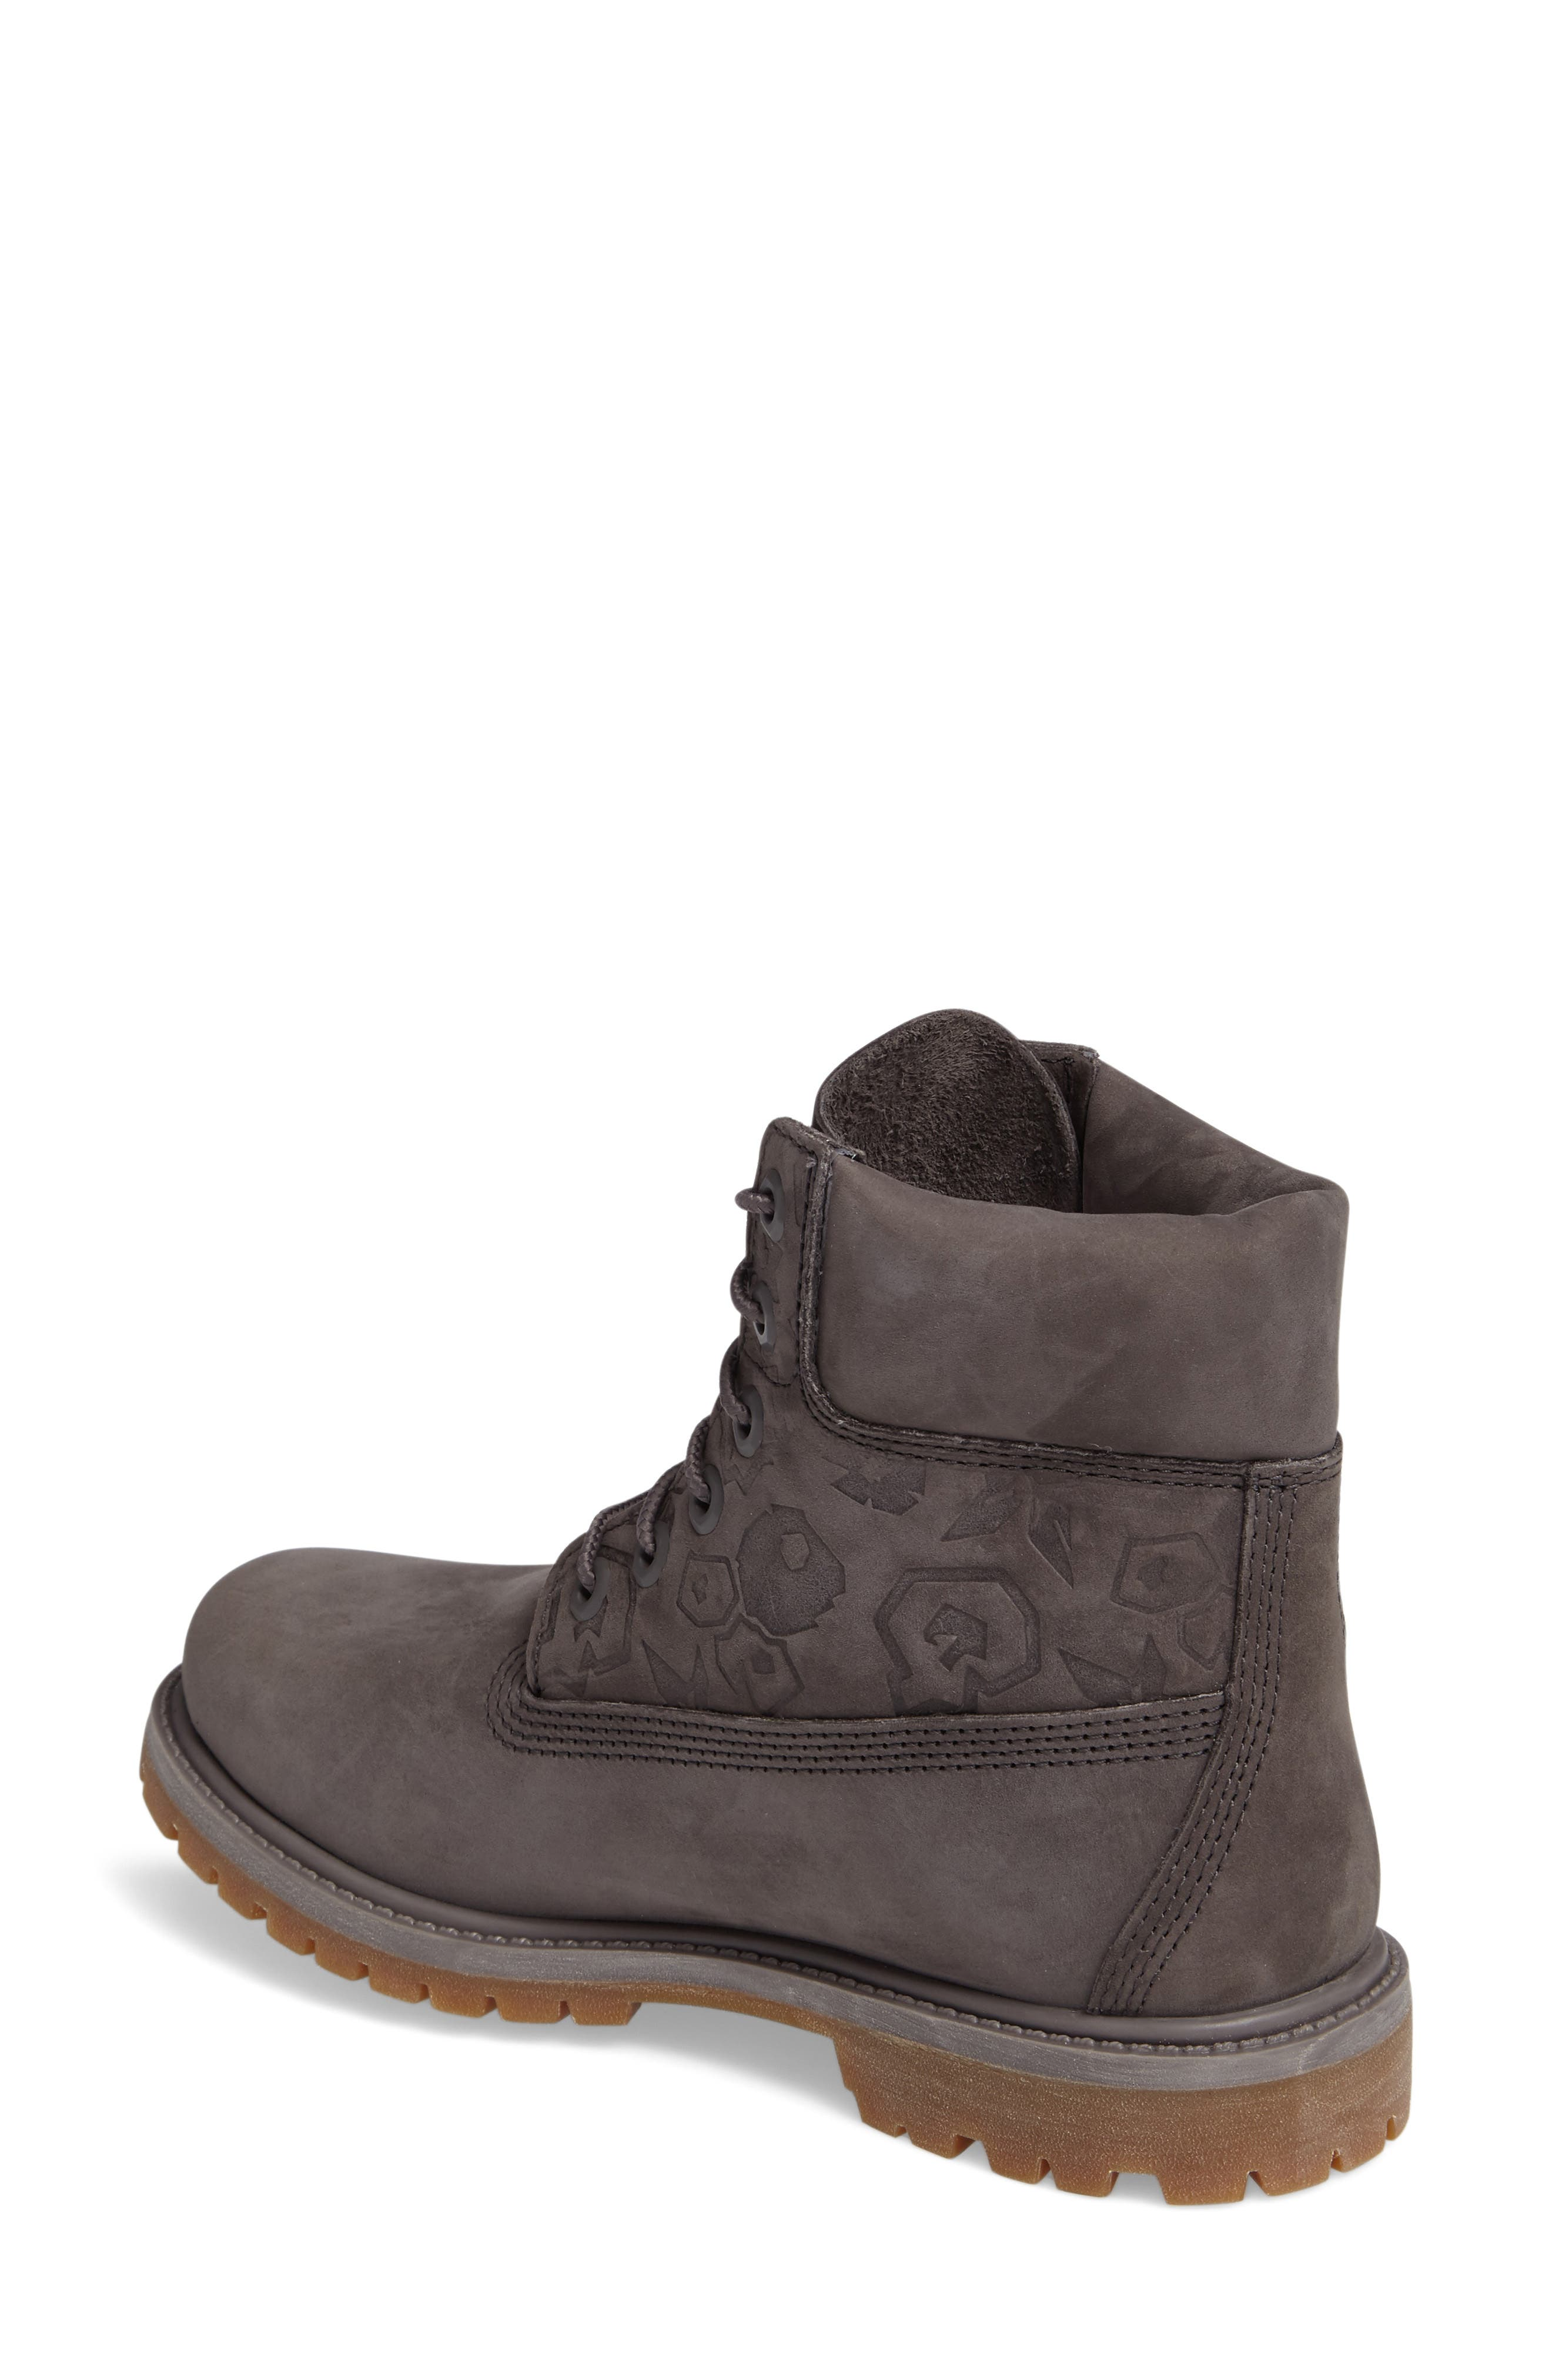 6-Inch Premium Embossed Waterproof Boot,                             Alternate thumbnail 2, color,                             021